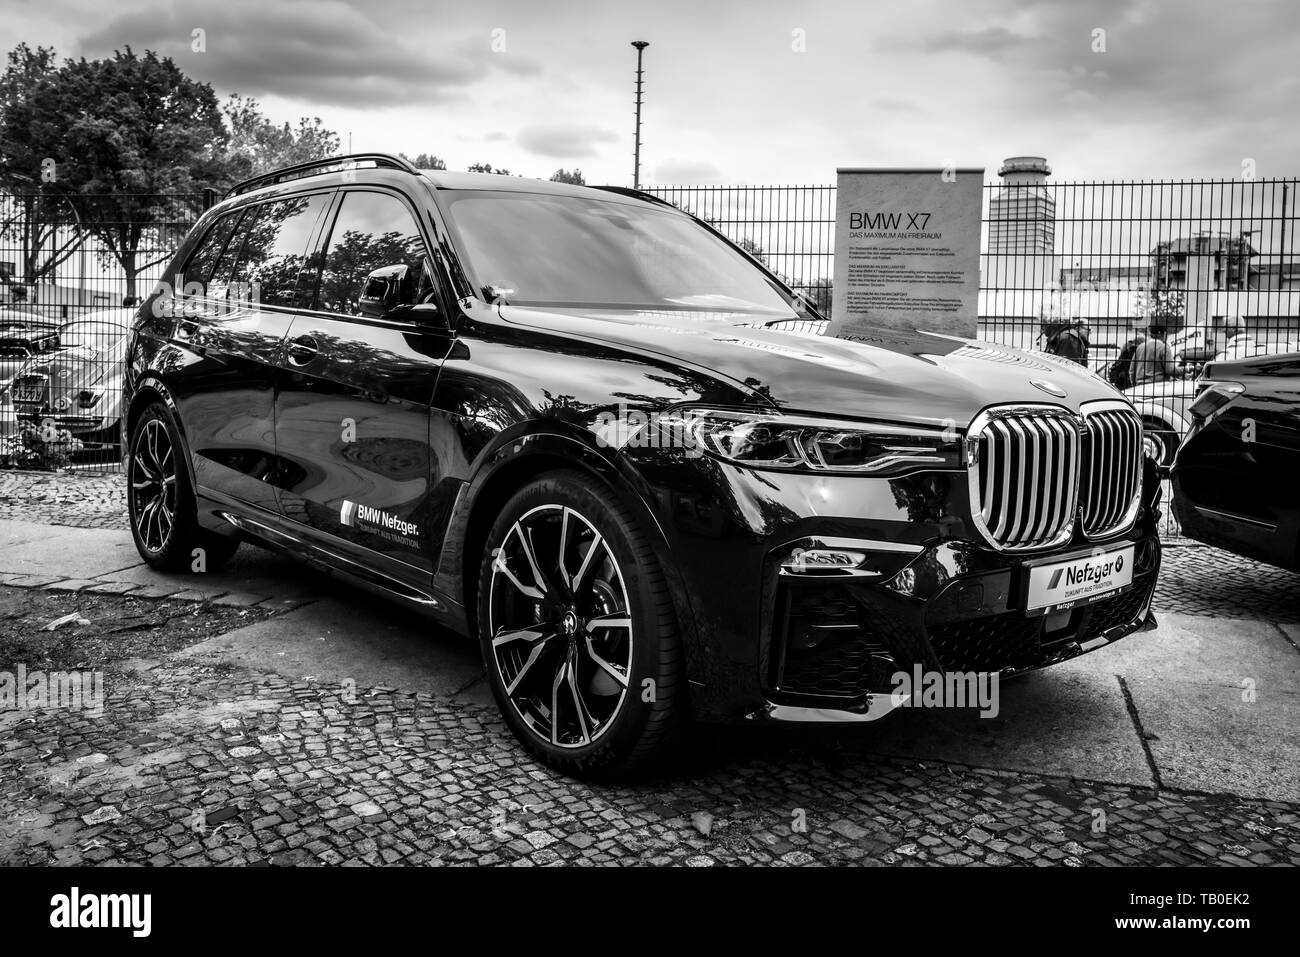 Berlin May 11 2019 Full Size Luxury Suv Bmw X7 Xdrive40i Black And White 32th Berlin Brandenburg Oldtimer Day Stock Photo Alamy